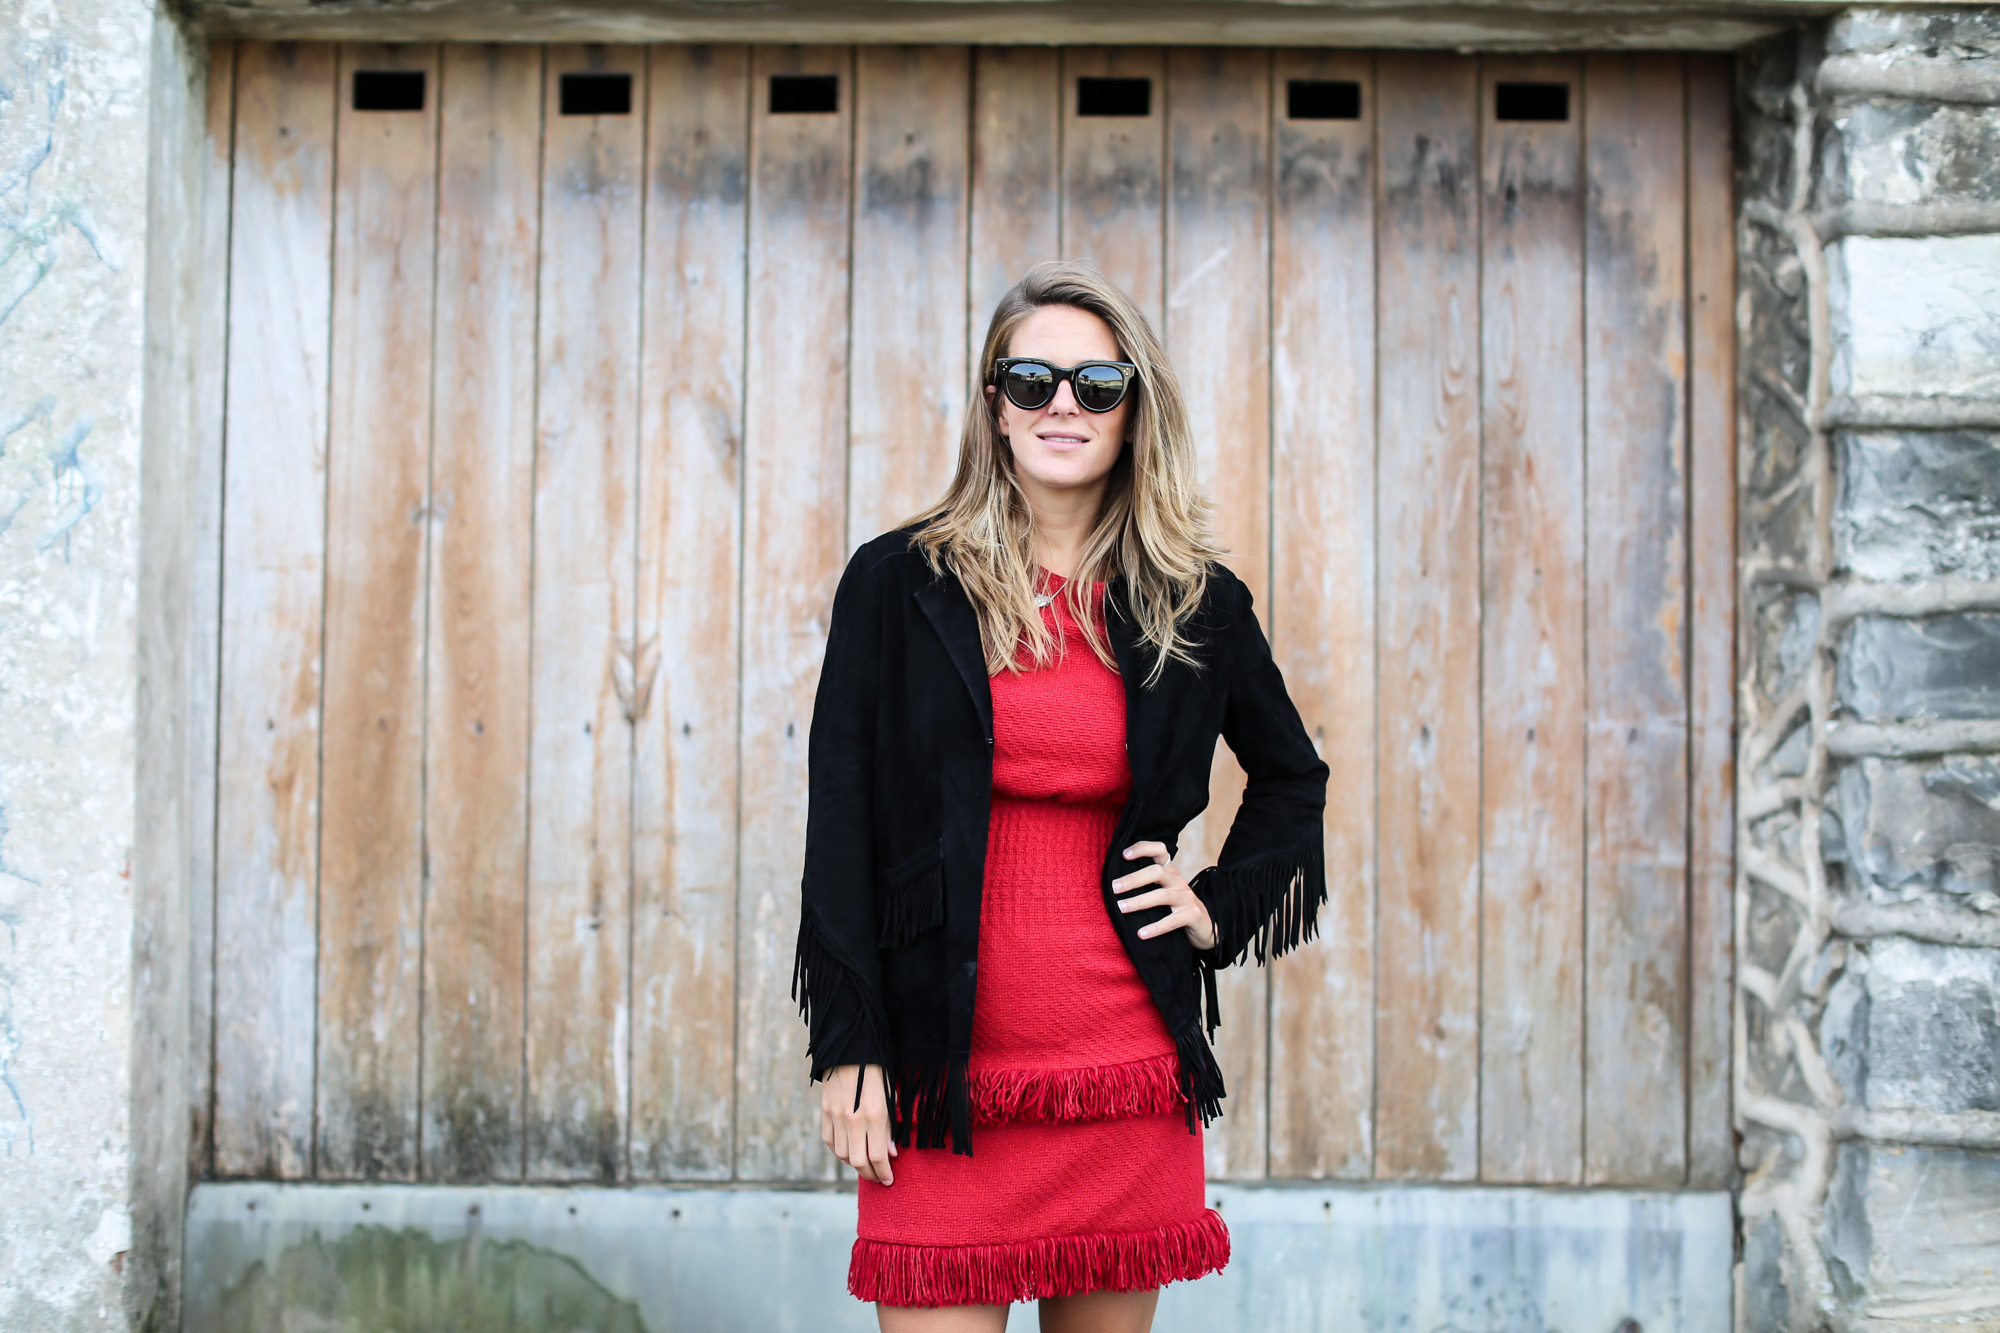 clochet_streetstyle_fashioblogger_maje_paris_reddress_majesuedefringedjacket_pertini_brogues_celine_sunglasses-2